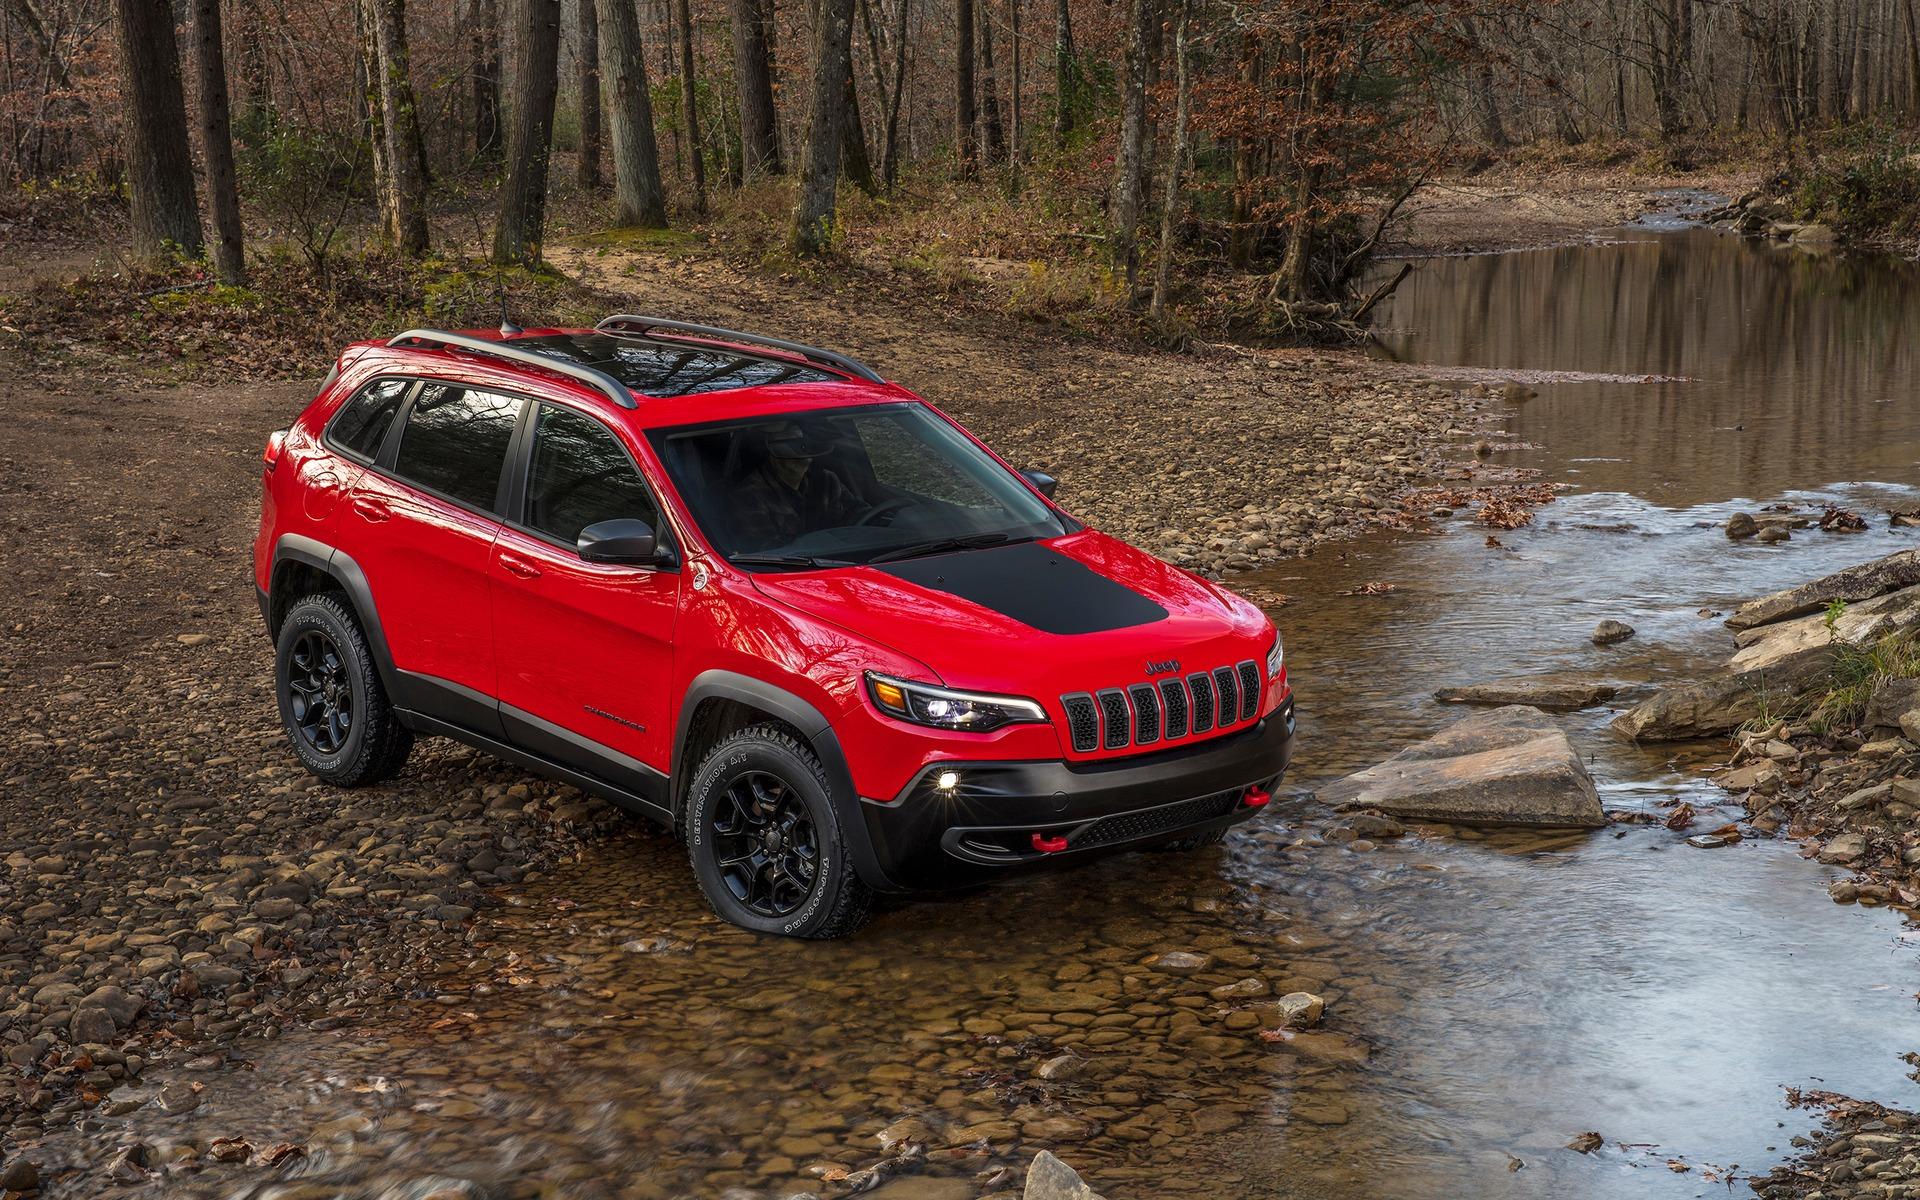 Jeep Cherokee 2019 : turbo ou V6? - Guide Auto